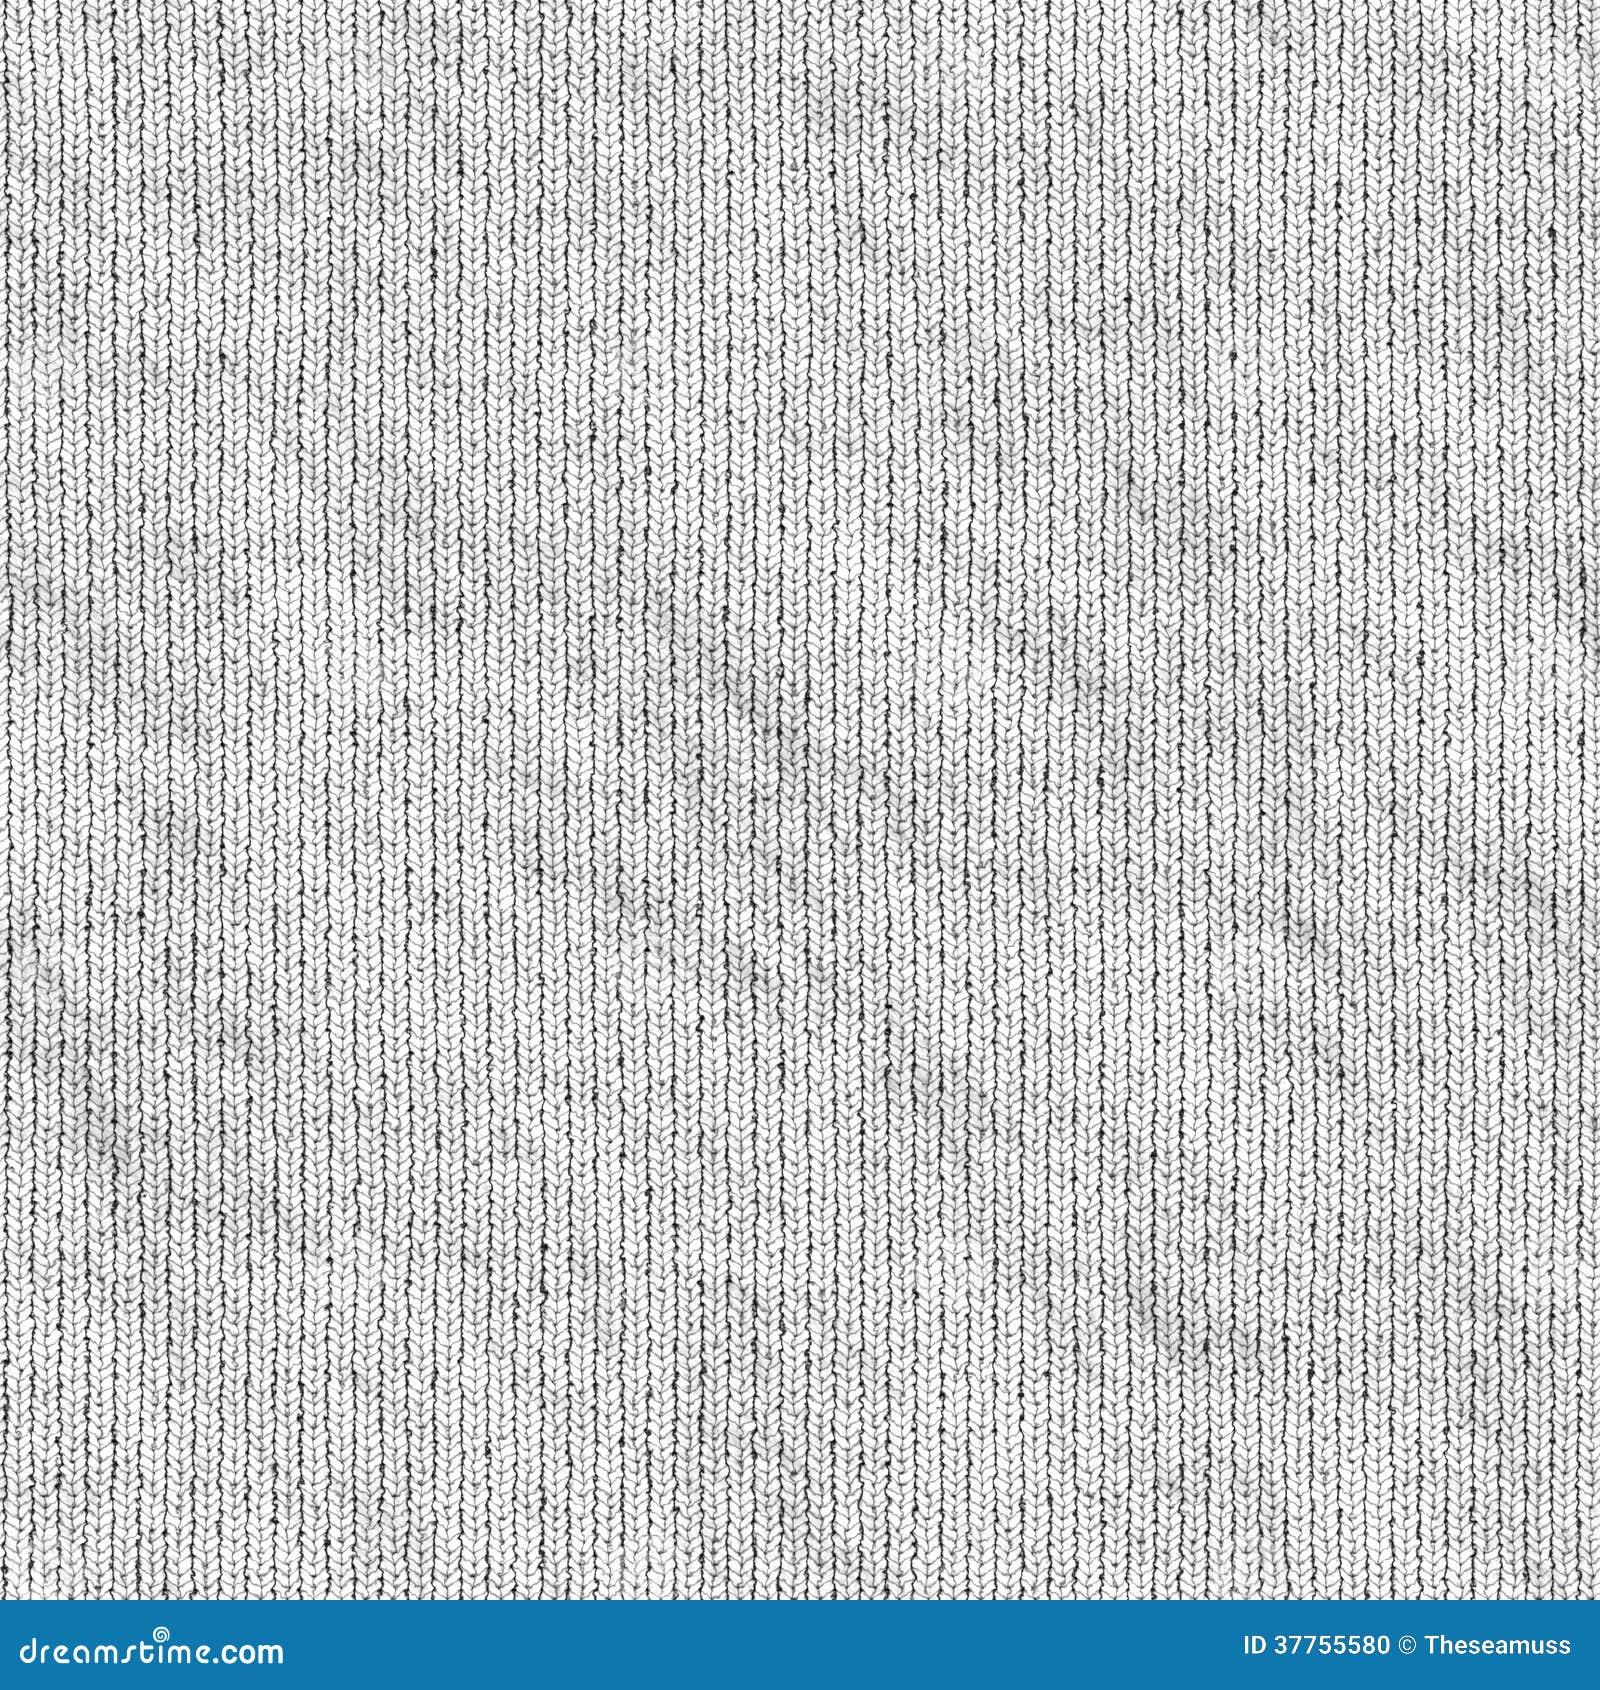 Seamless Cloth Texture Stock Photo Image 37755580